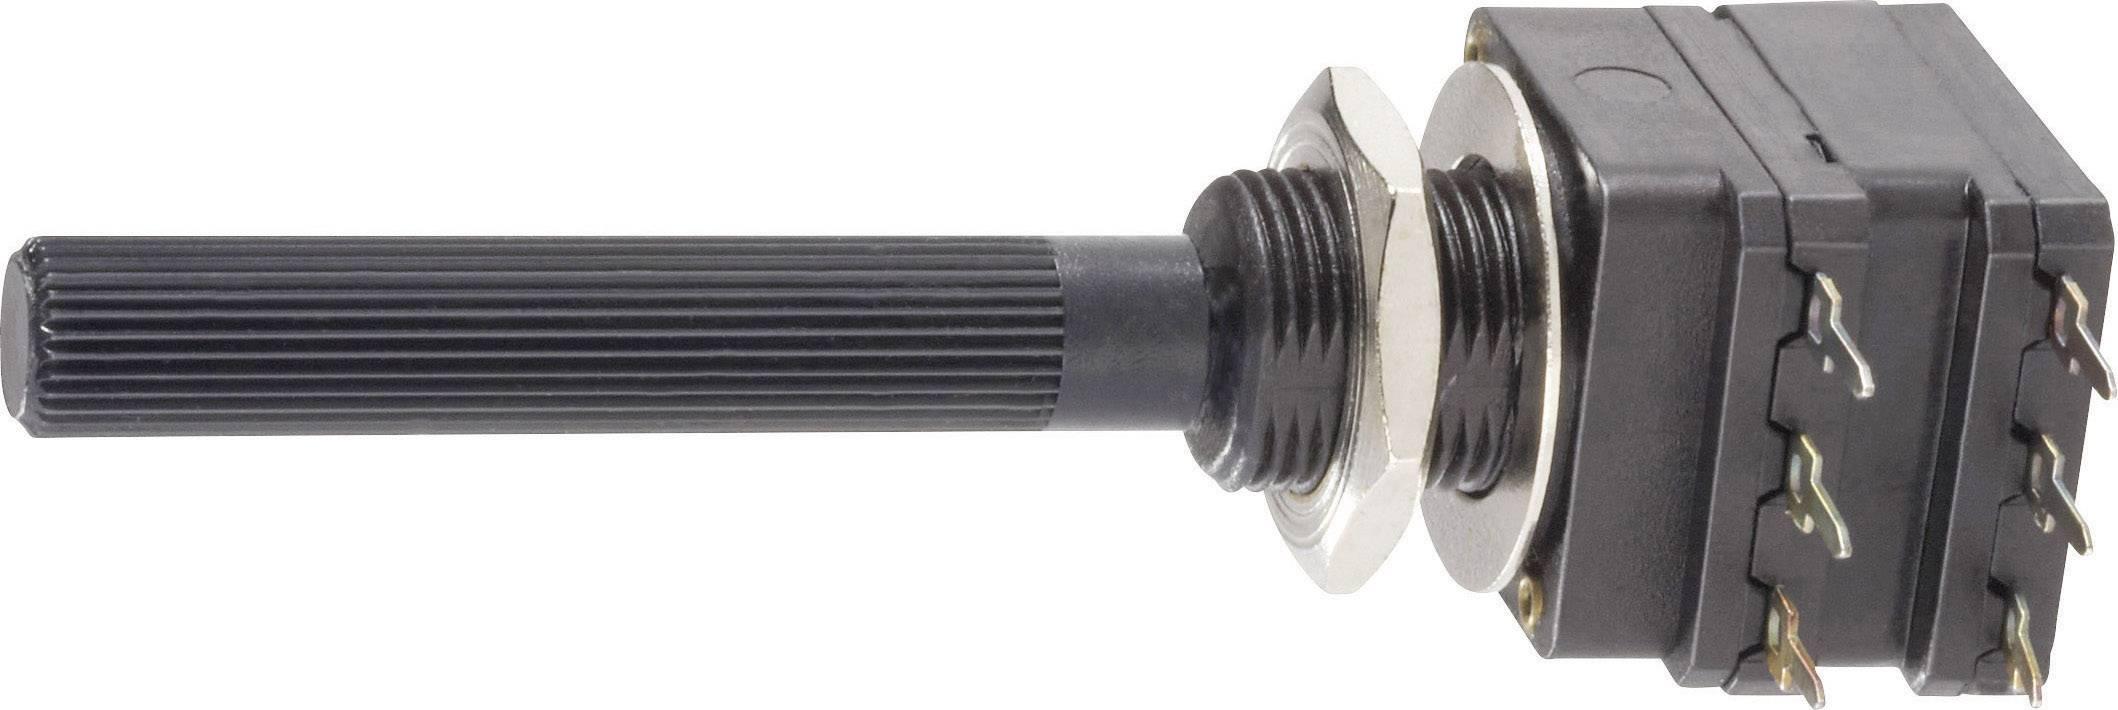 Otočný potenciometer stereo Piher PC16DH-10IP06473A2020MTA PC16DH-10IP06473A2020MTA, 0.2 W, 47 kOhm, 1 ks